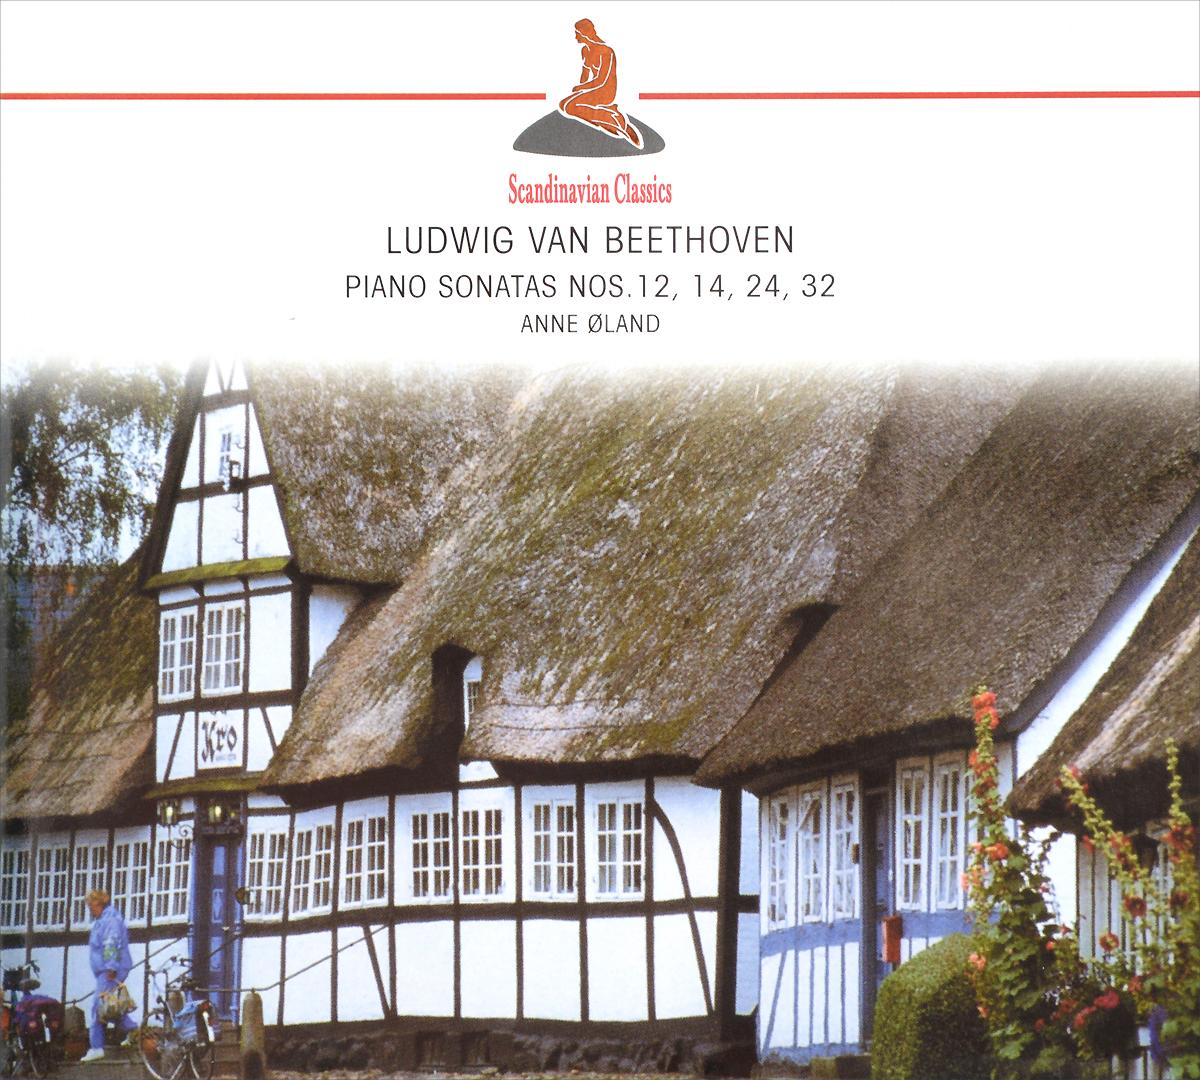 Scandinavian Classics. Anne Oland. Ludwig van Beethoven. Piano Sonatas Nos. 12, 14, 24, 32